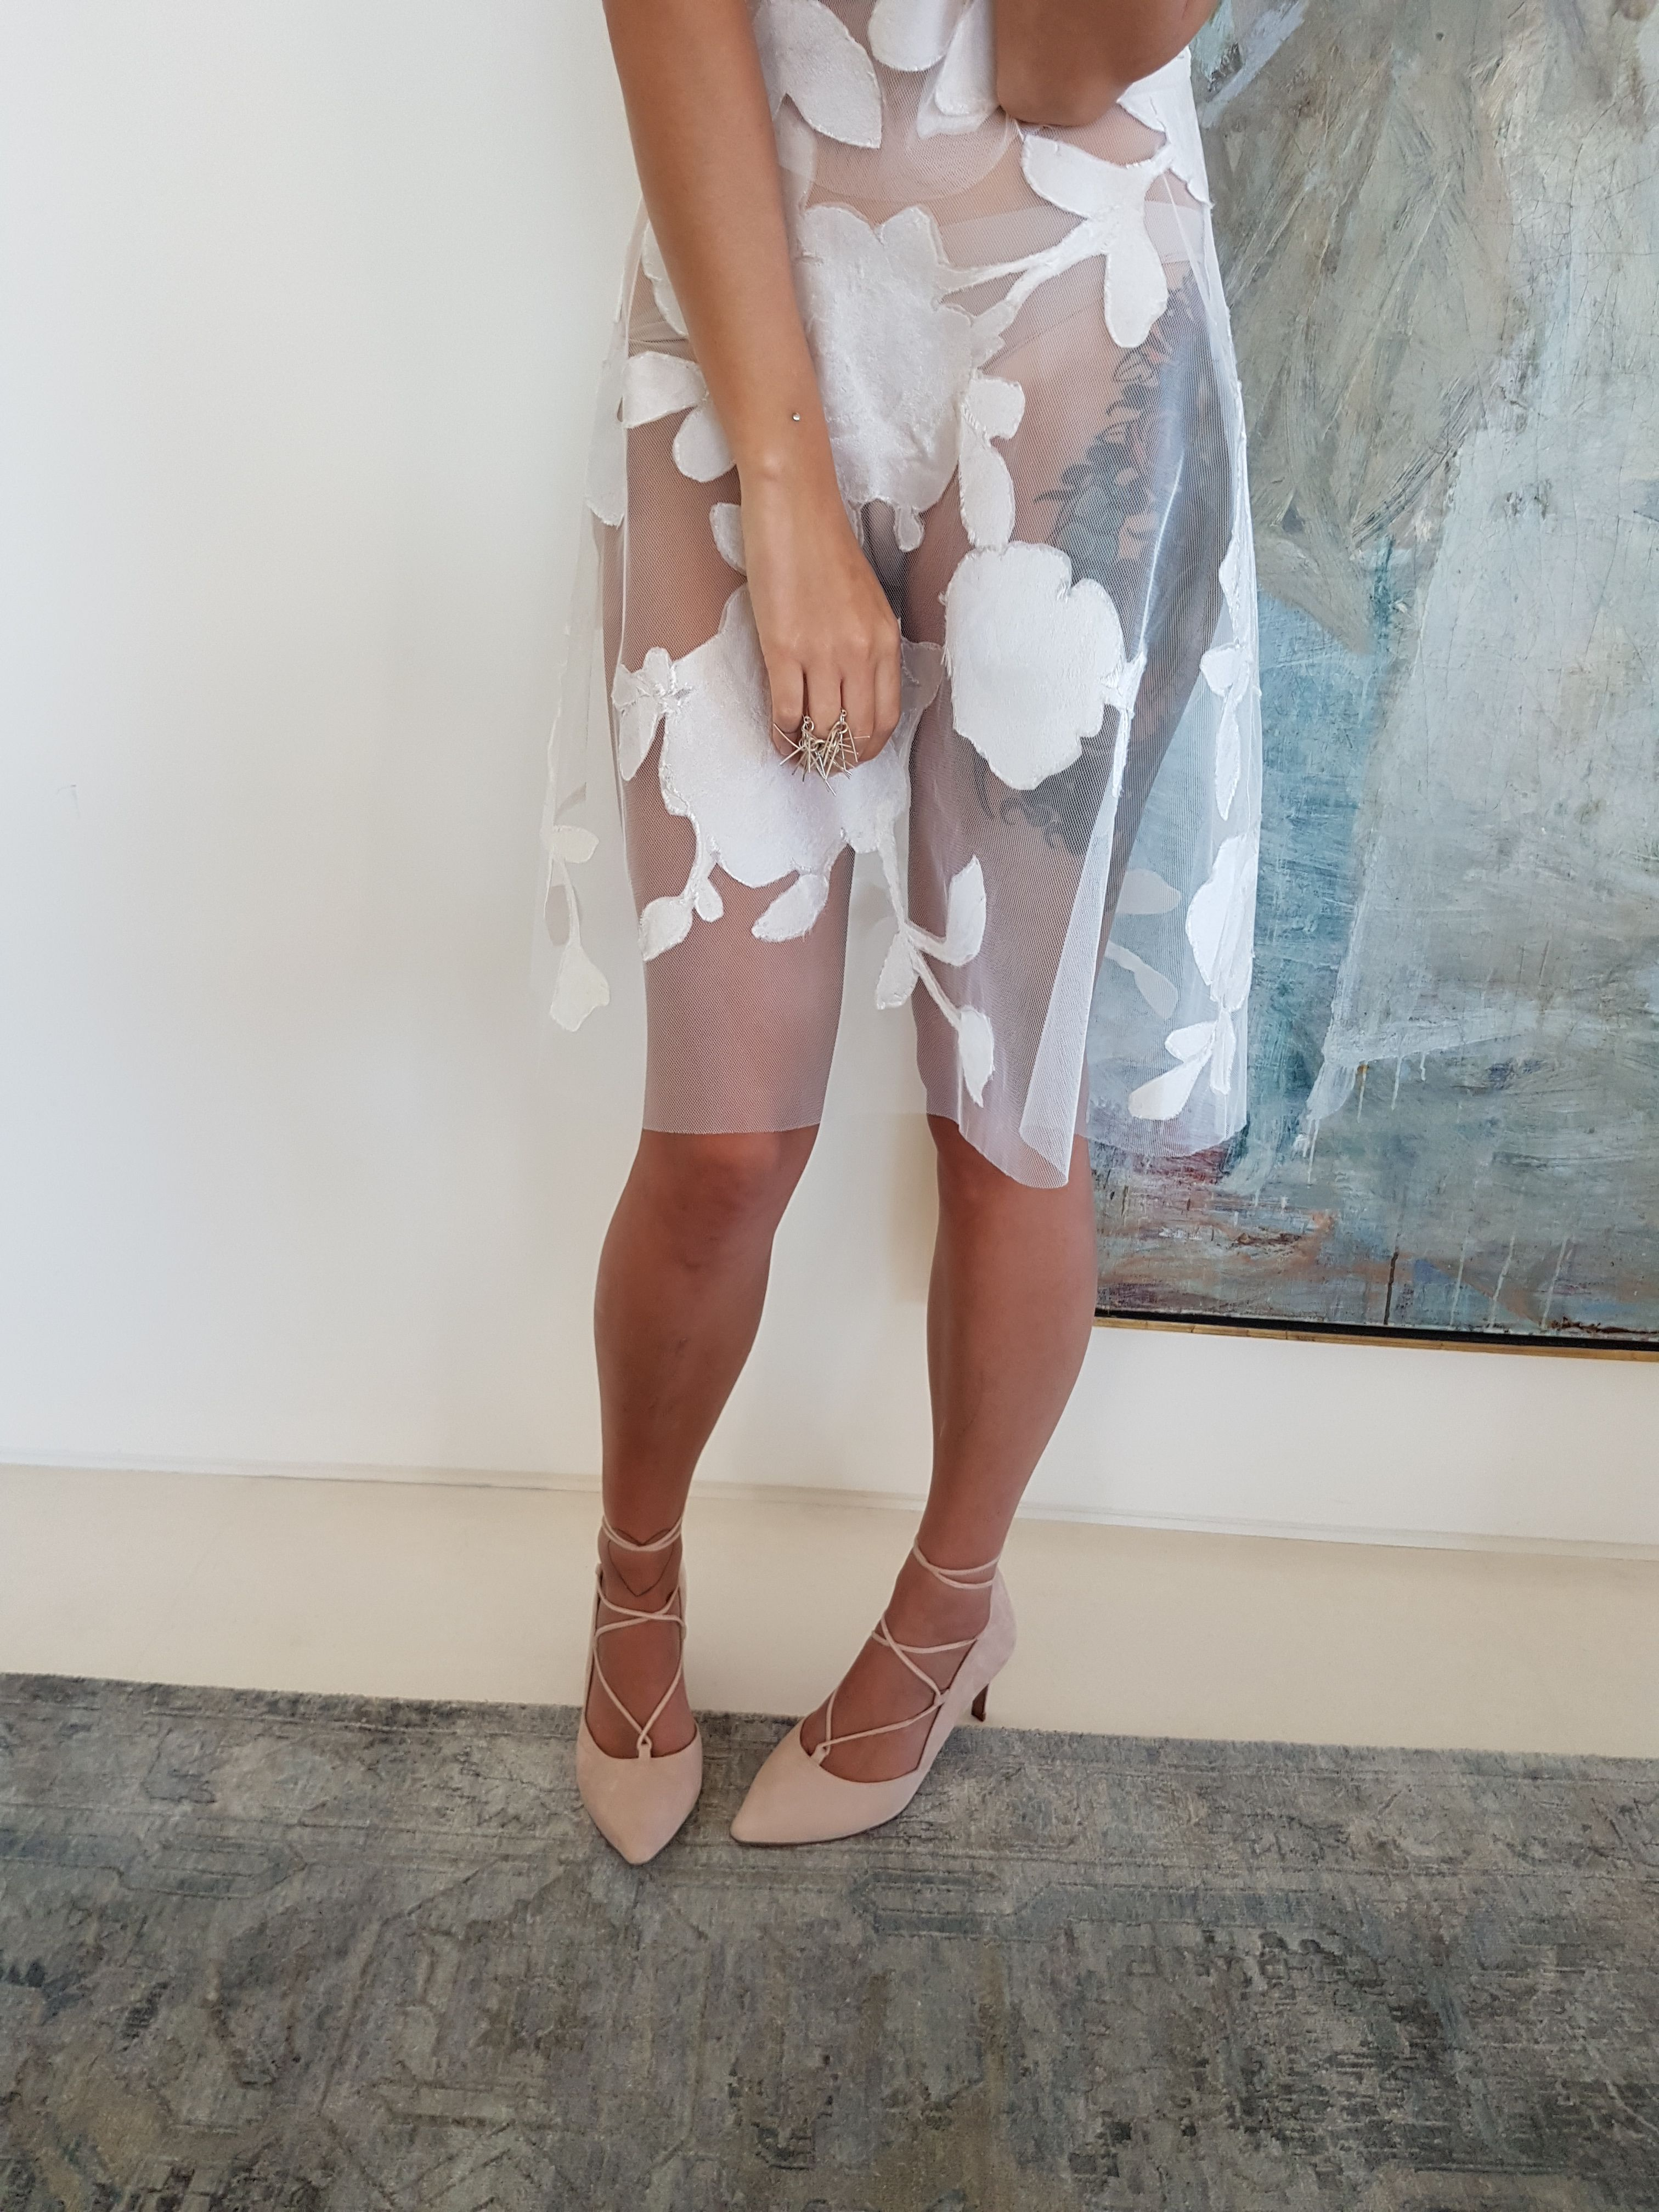 Lace Up Heel Pump In Nude Suede Wedding Shoes